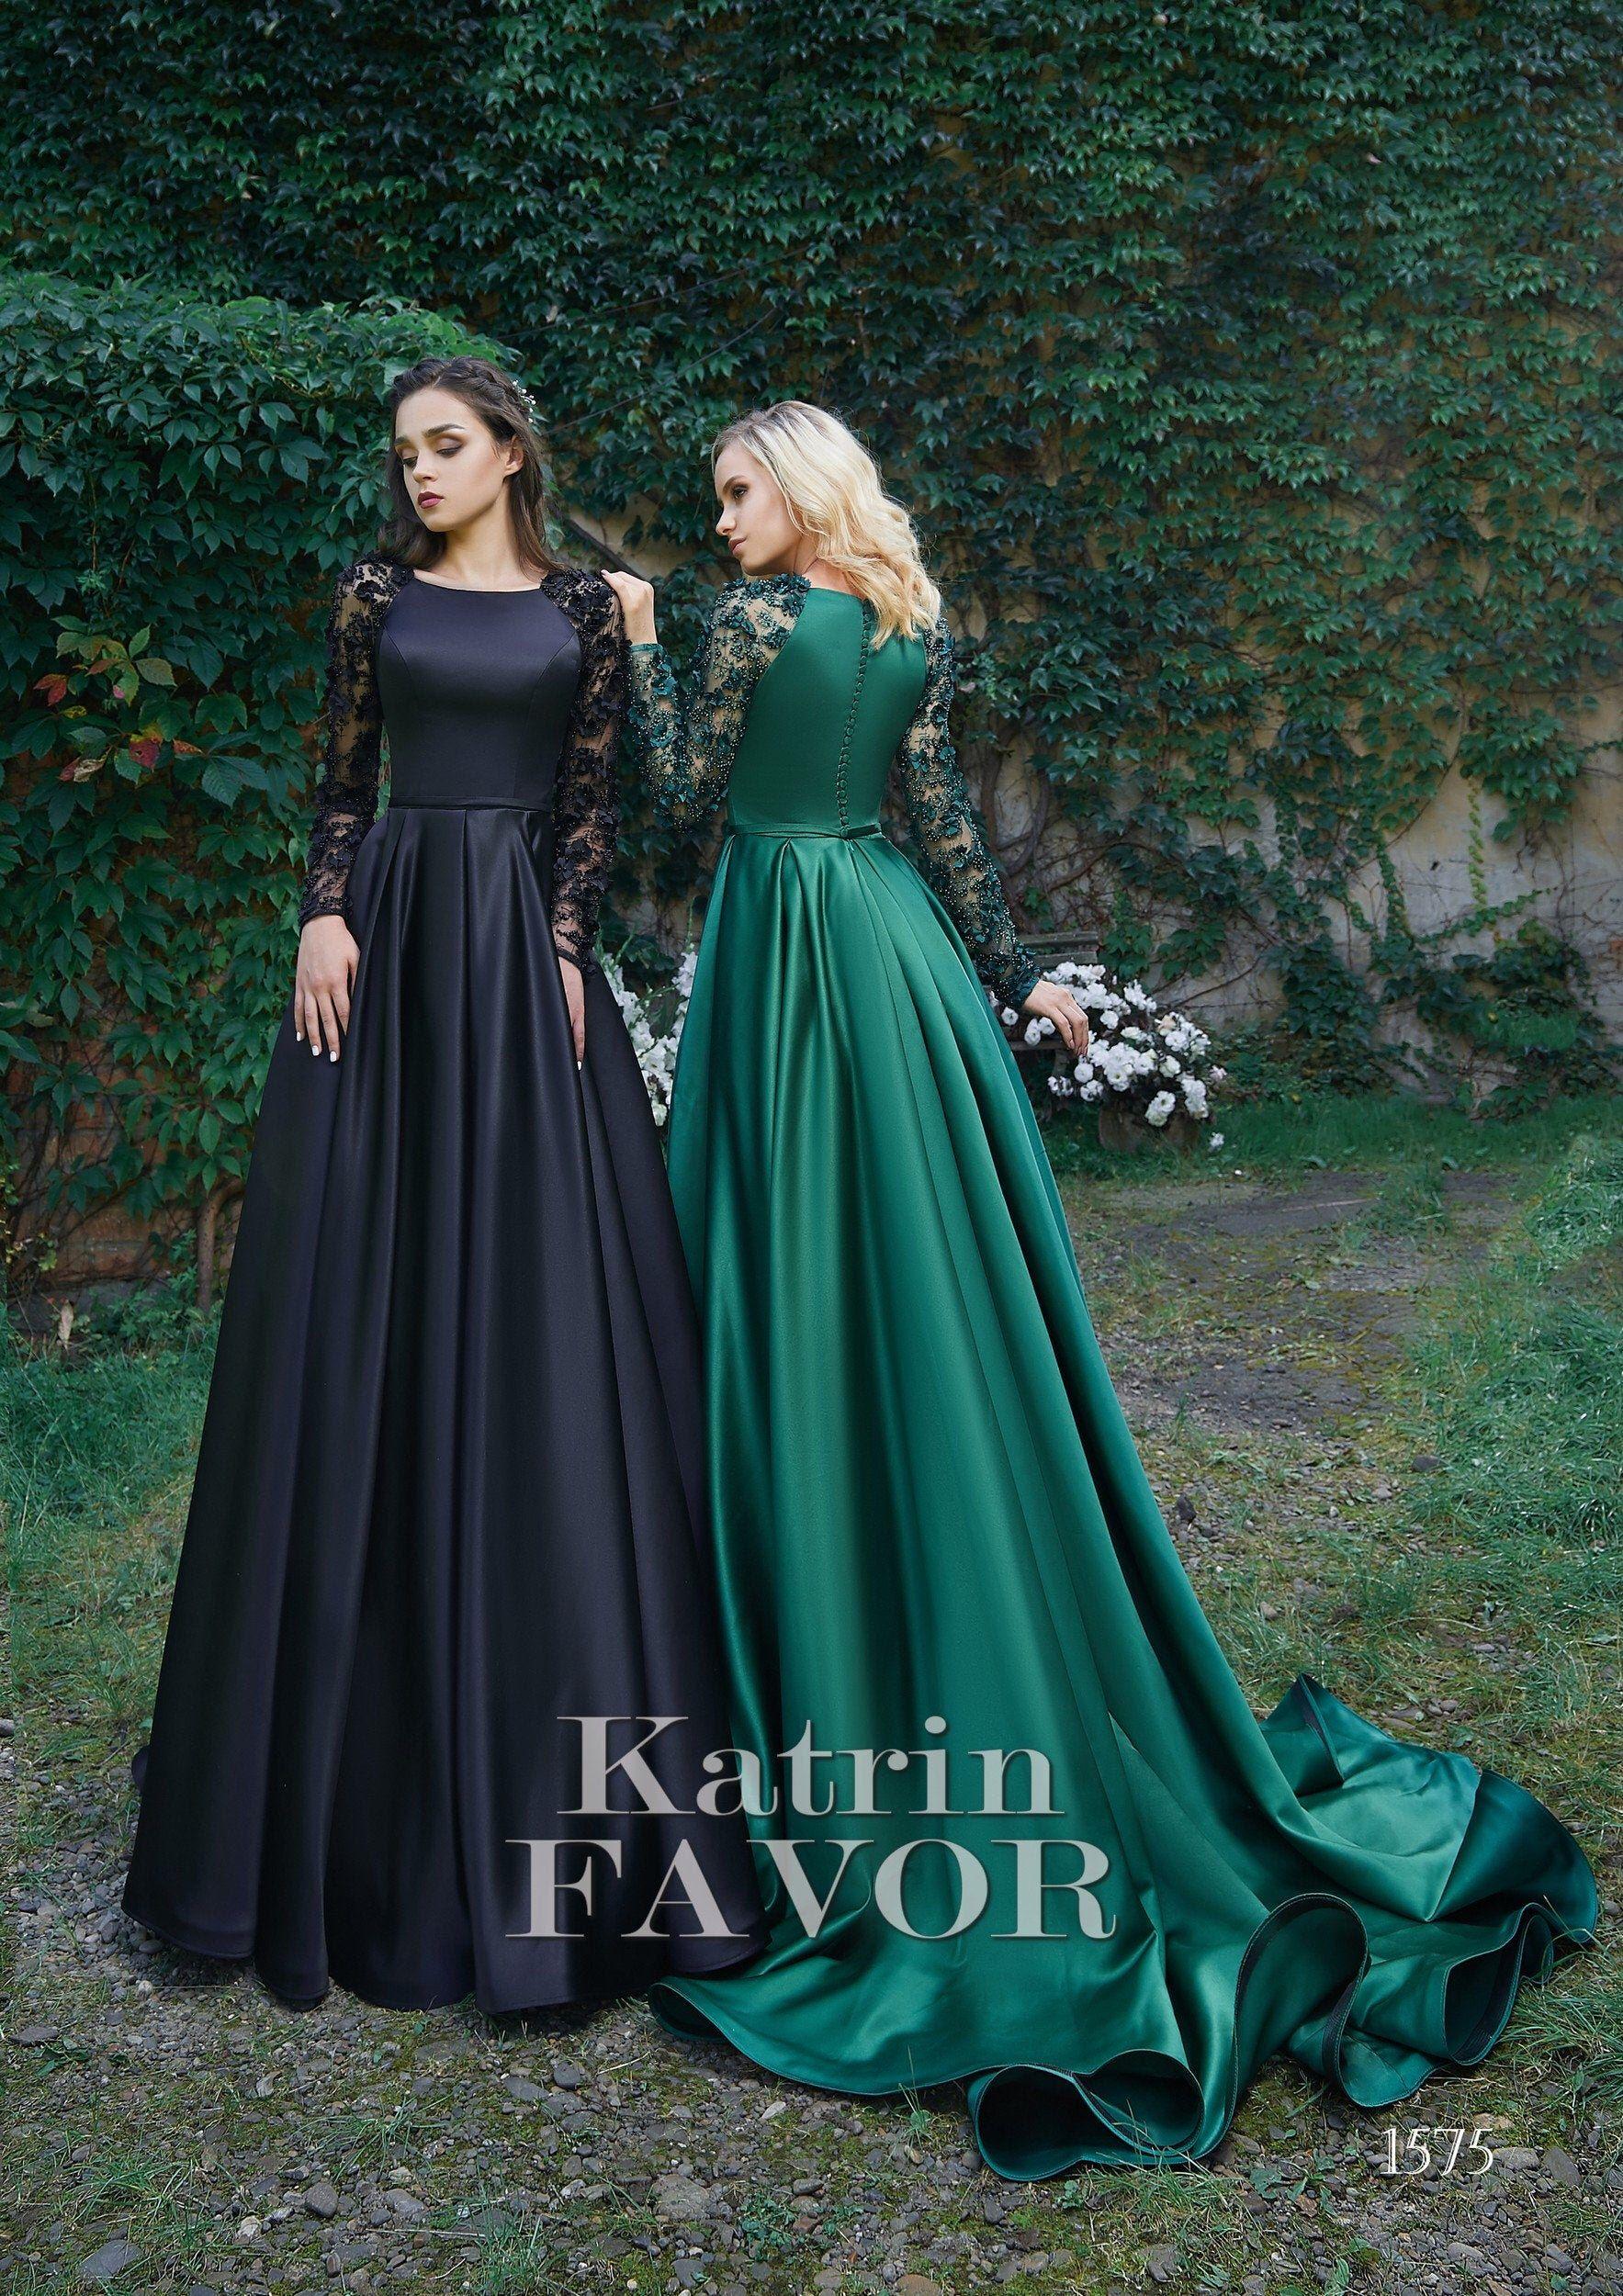 Black Wedding Dress Long Sleeve Dress Prom Dress Long Evening Etsy Prom Dresses Long With Sleeves Green Wedding Dresses Long Sleeve Evening Gowns [ 2500 x 1767 Pixel ]